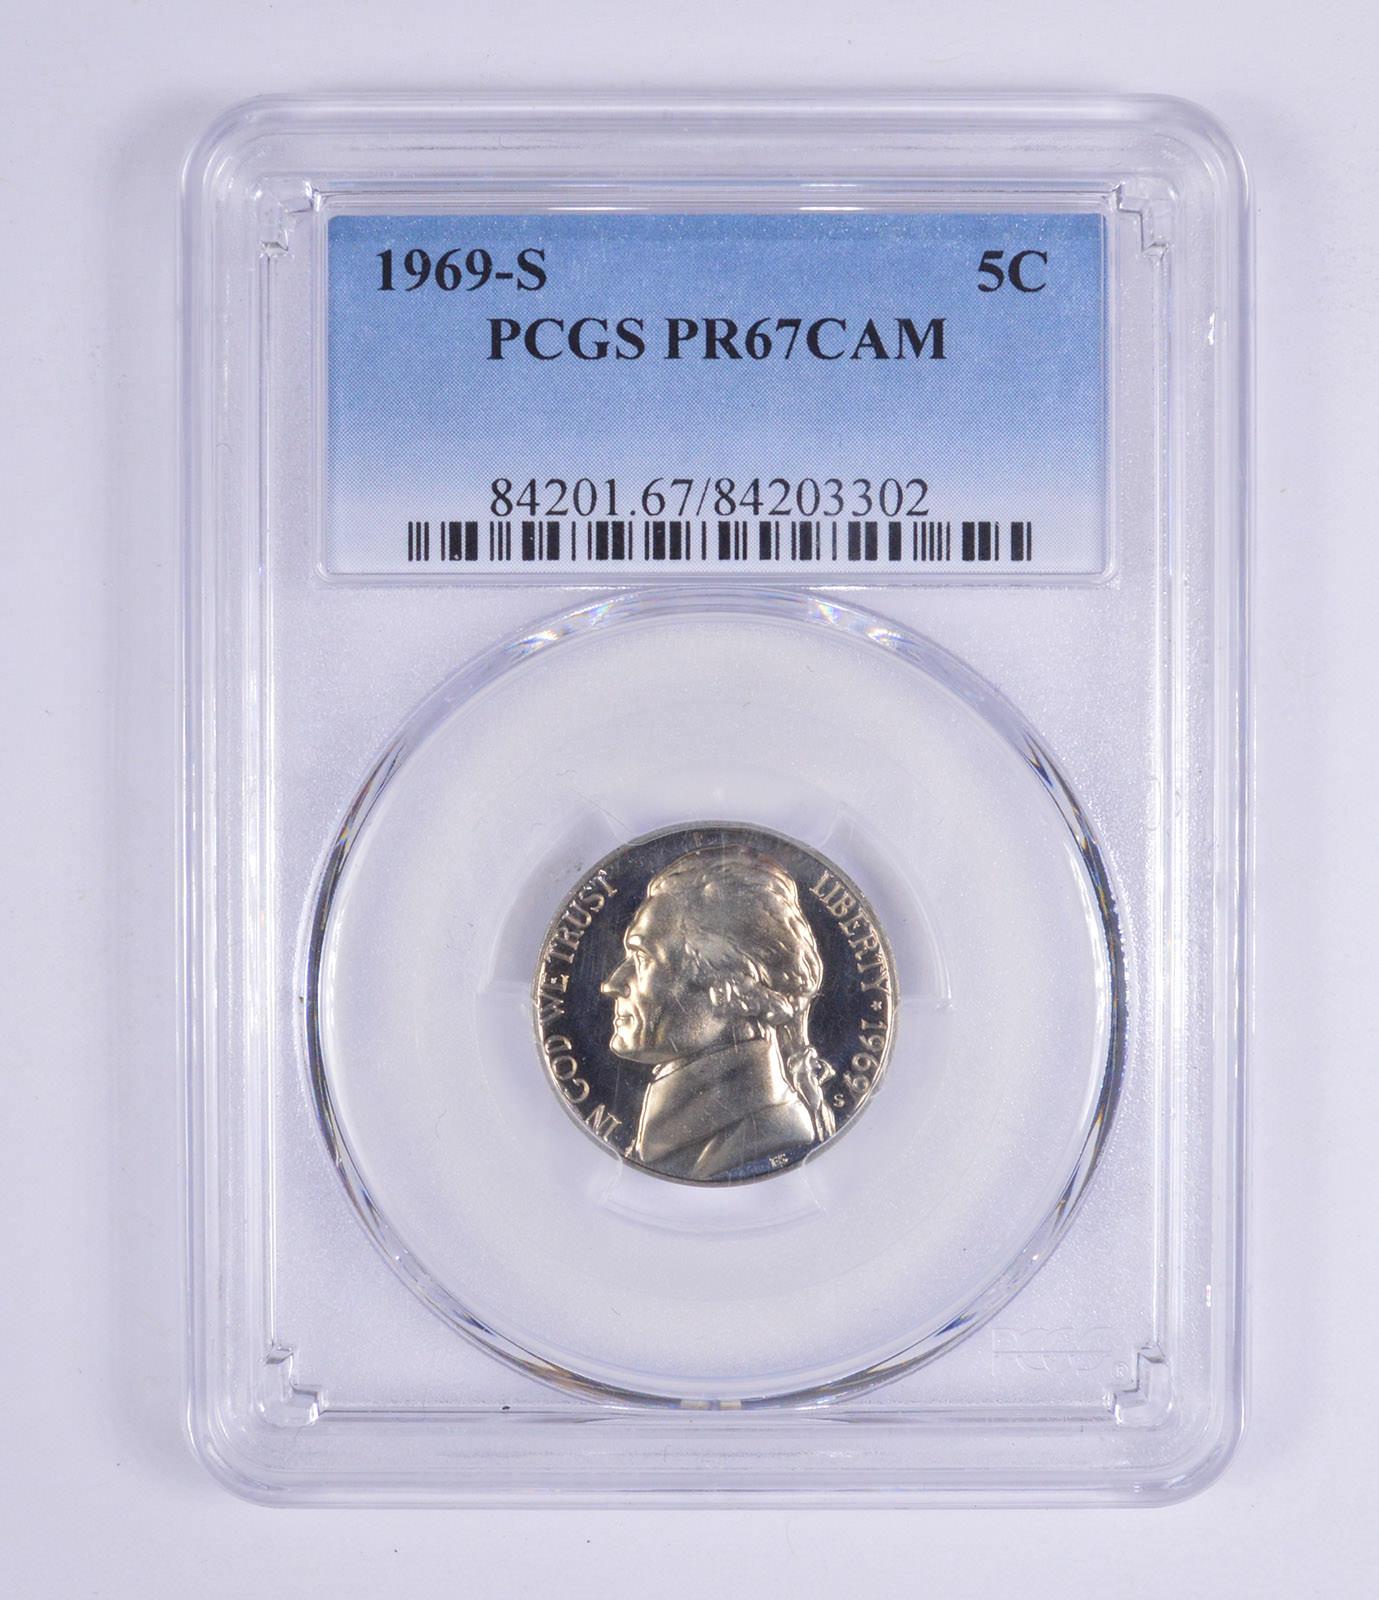 Graded - PR67CAM 1969-S Jefferson Nickel - Proof